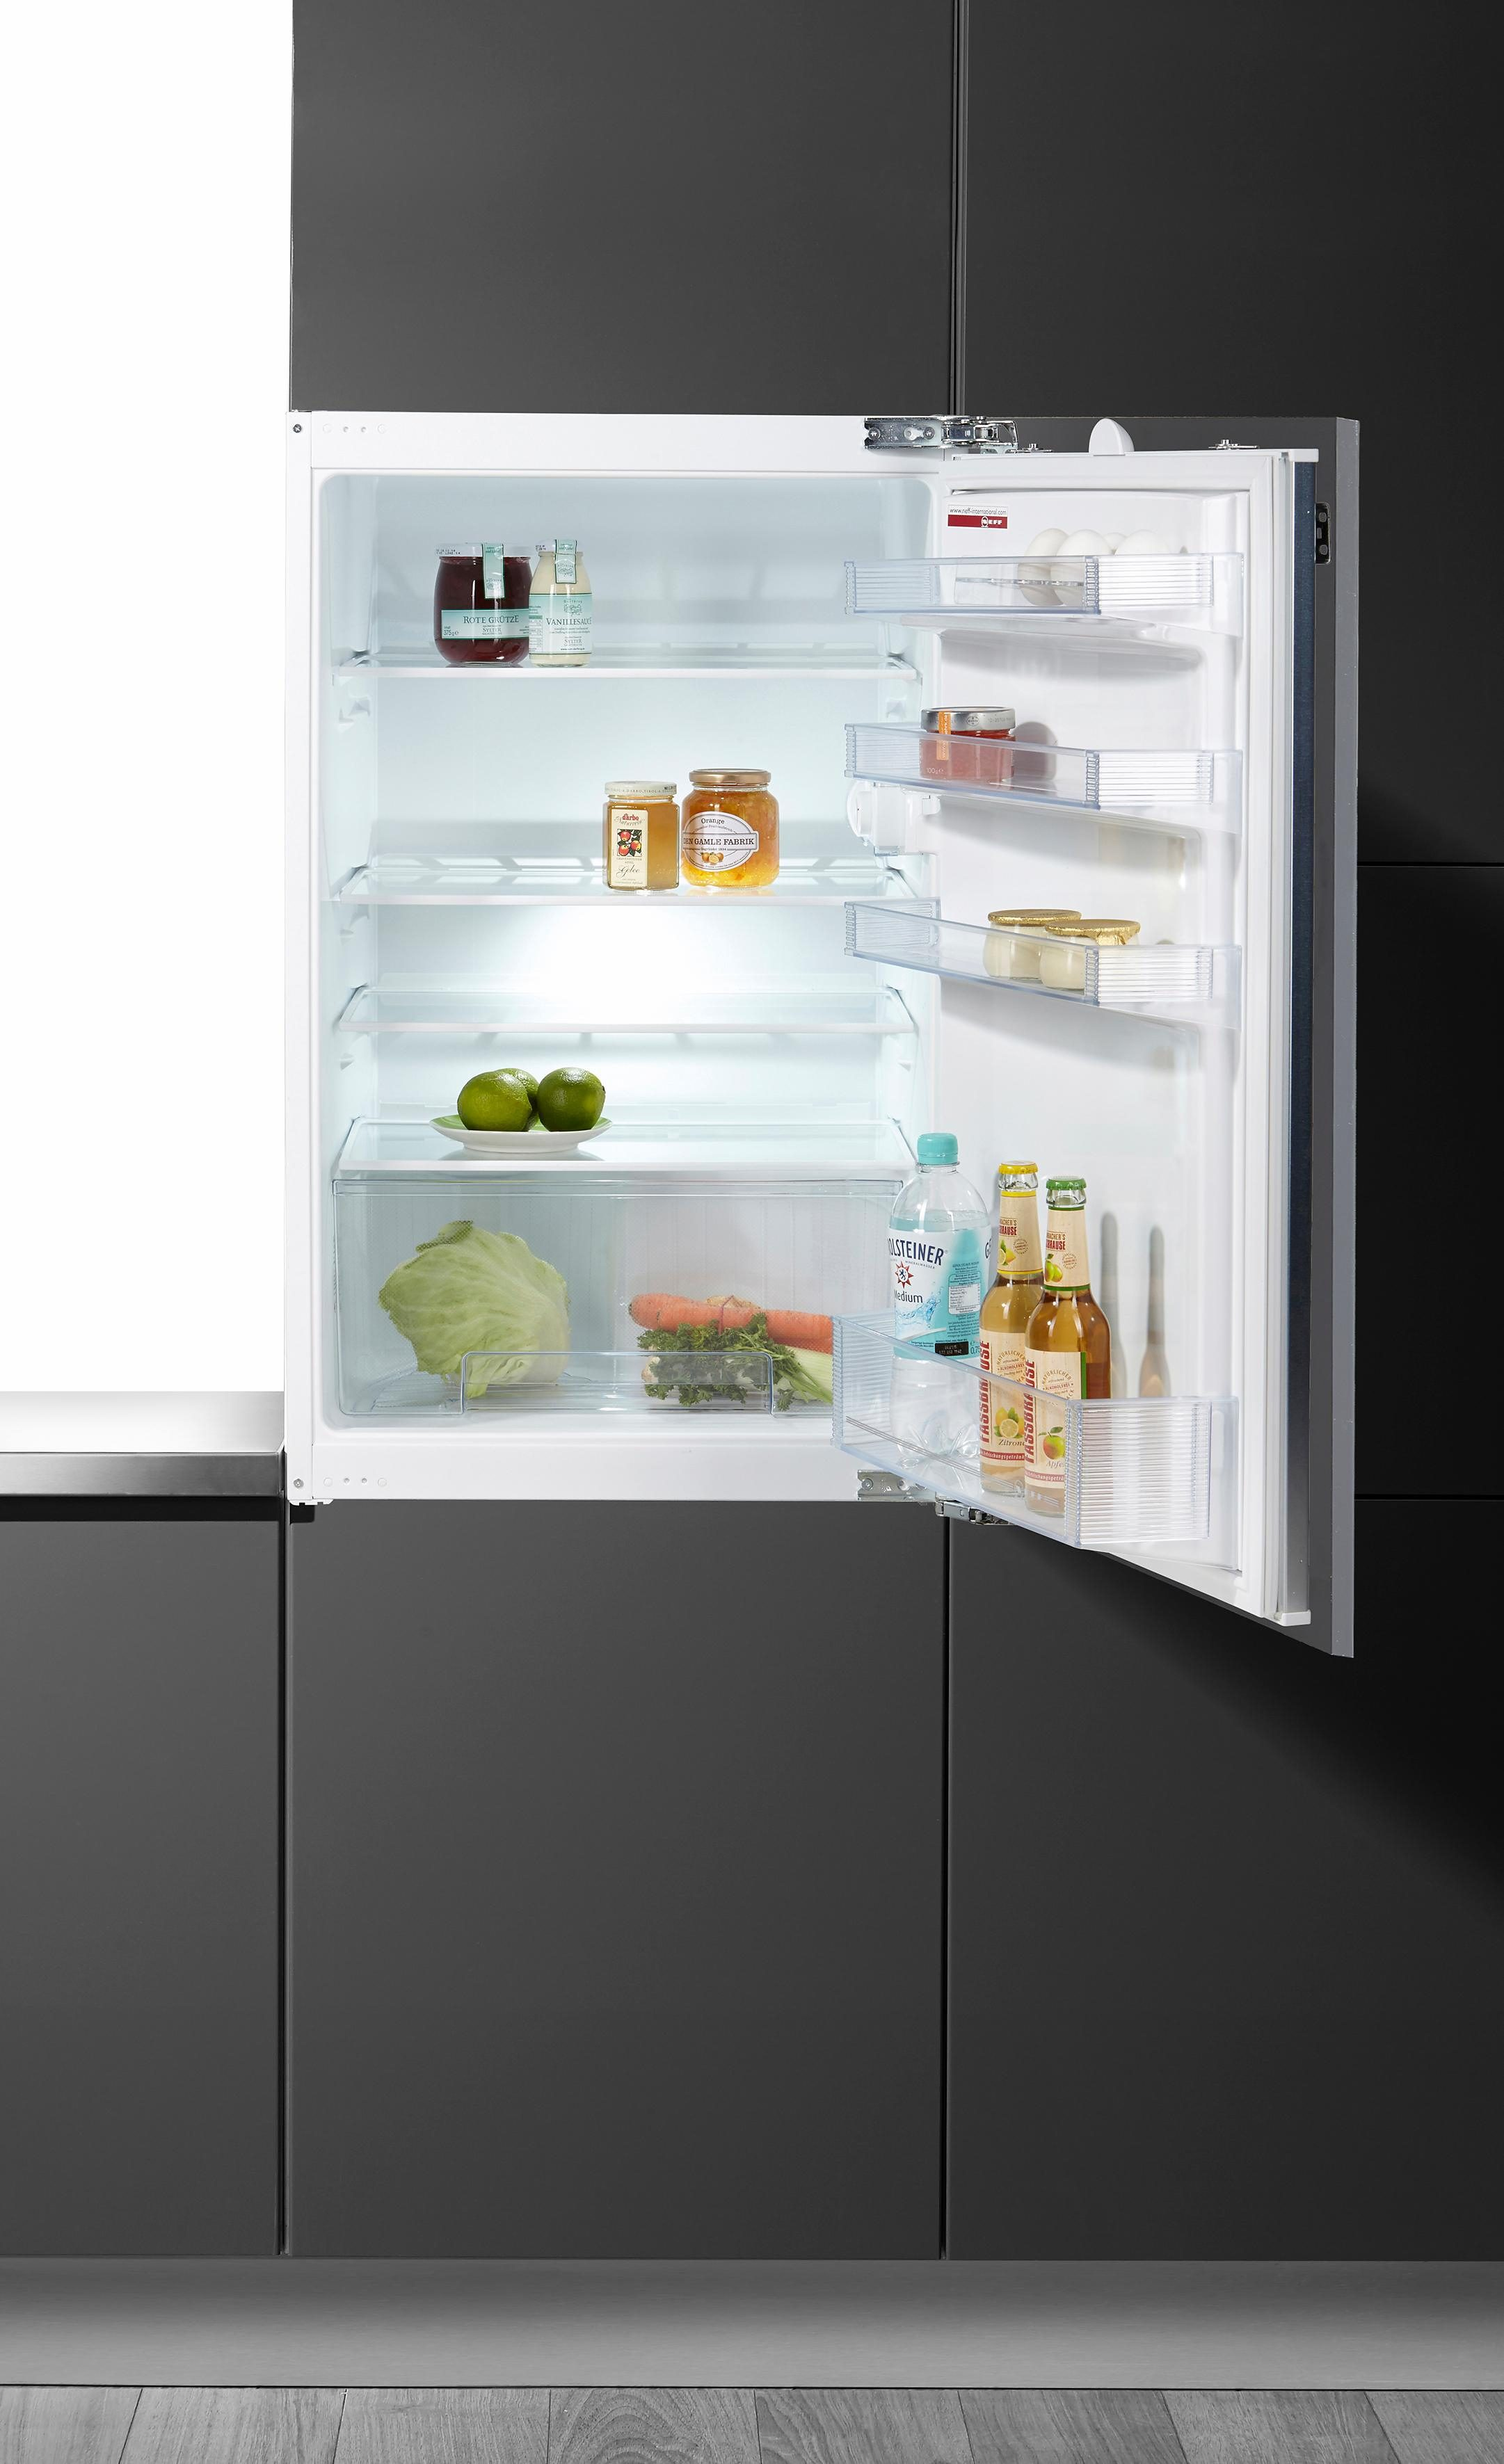 Neff Integrierbarer Einbau-Kühlschrank K 215 A1, A+, 87,4 cm hoch